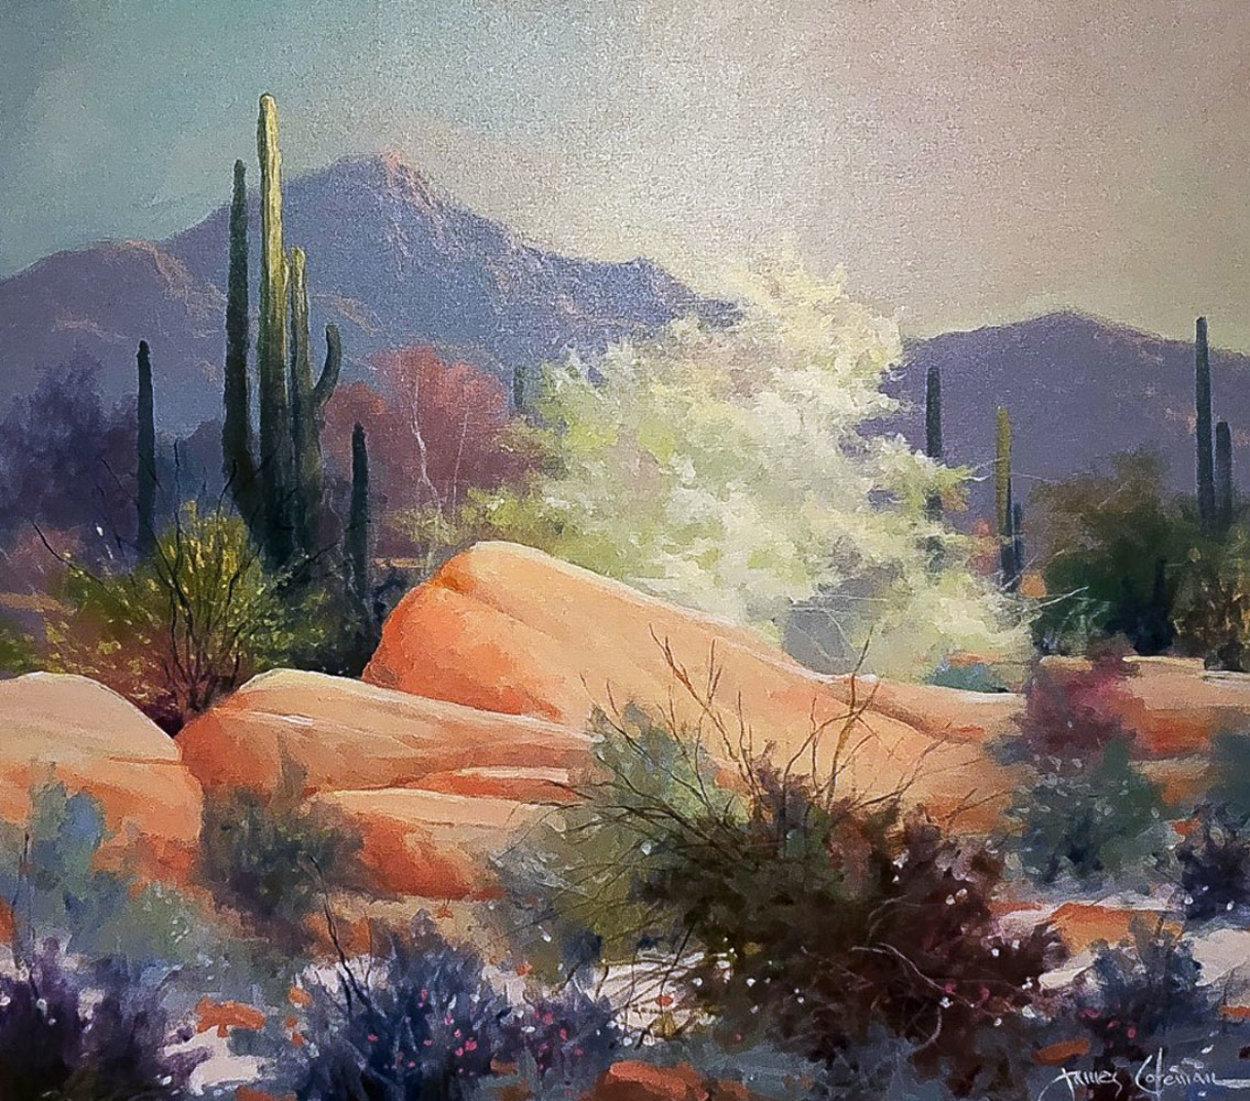 Sonoran Desert 1989 37x43 Huge Original Painting by James Coleman